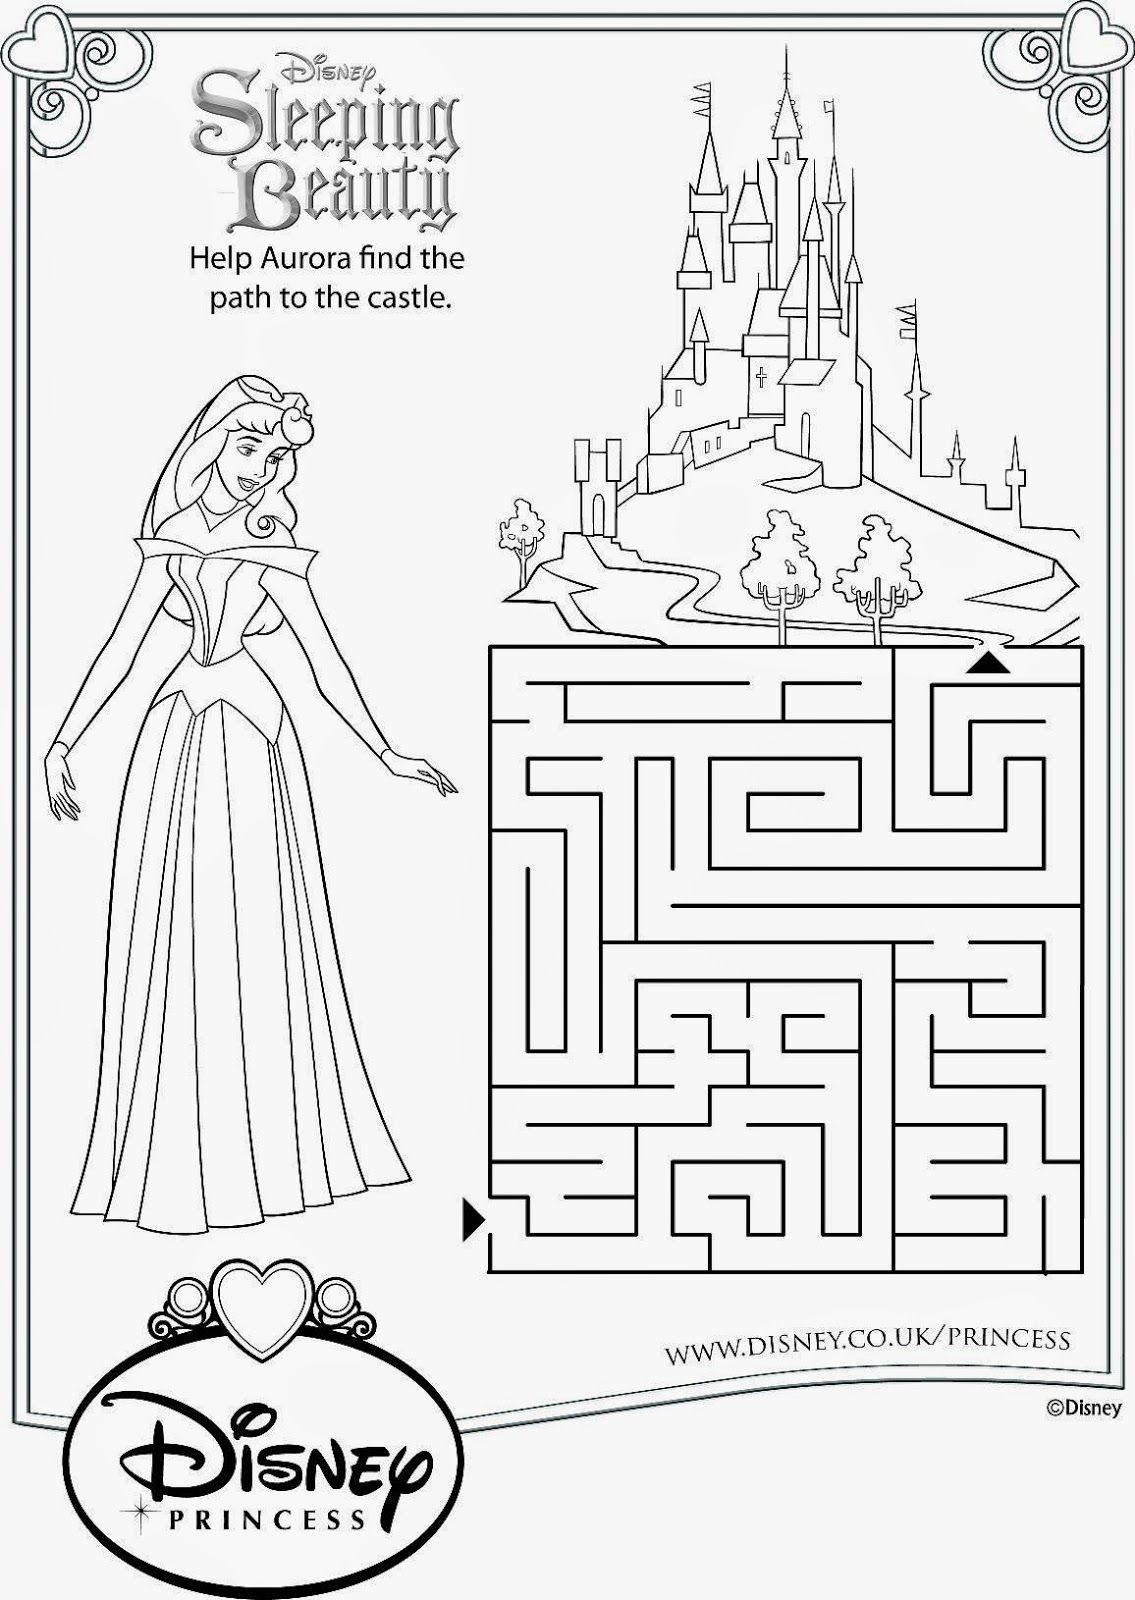 Sleeping Beauty Activity Sheets Free Printables Drawing Colouring